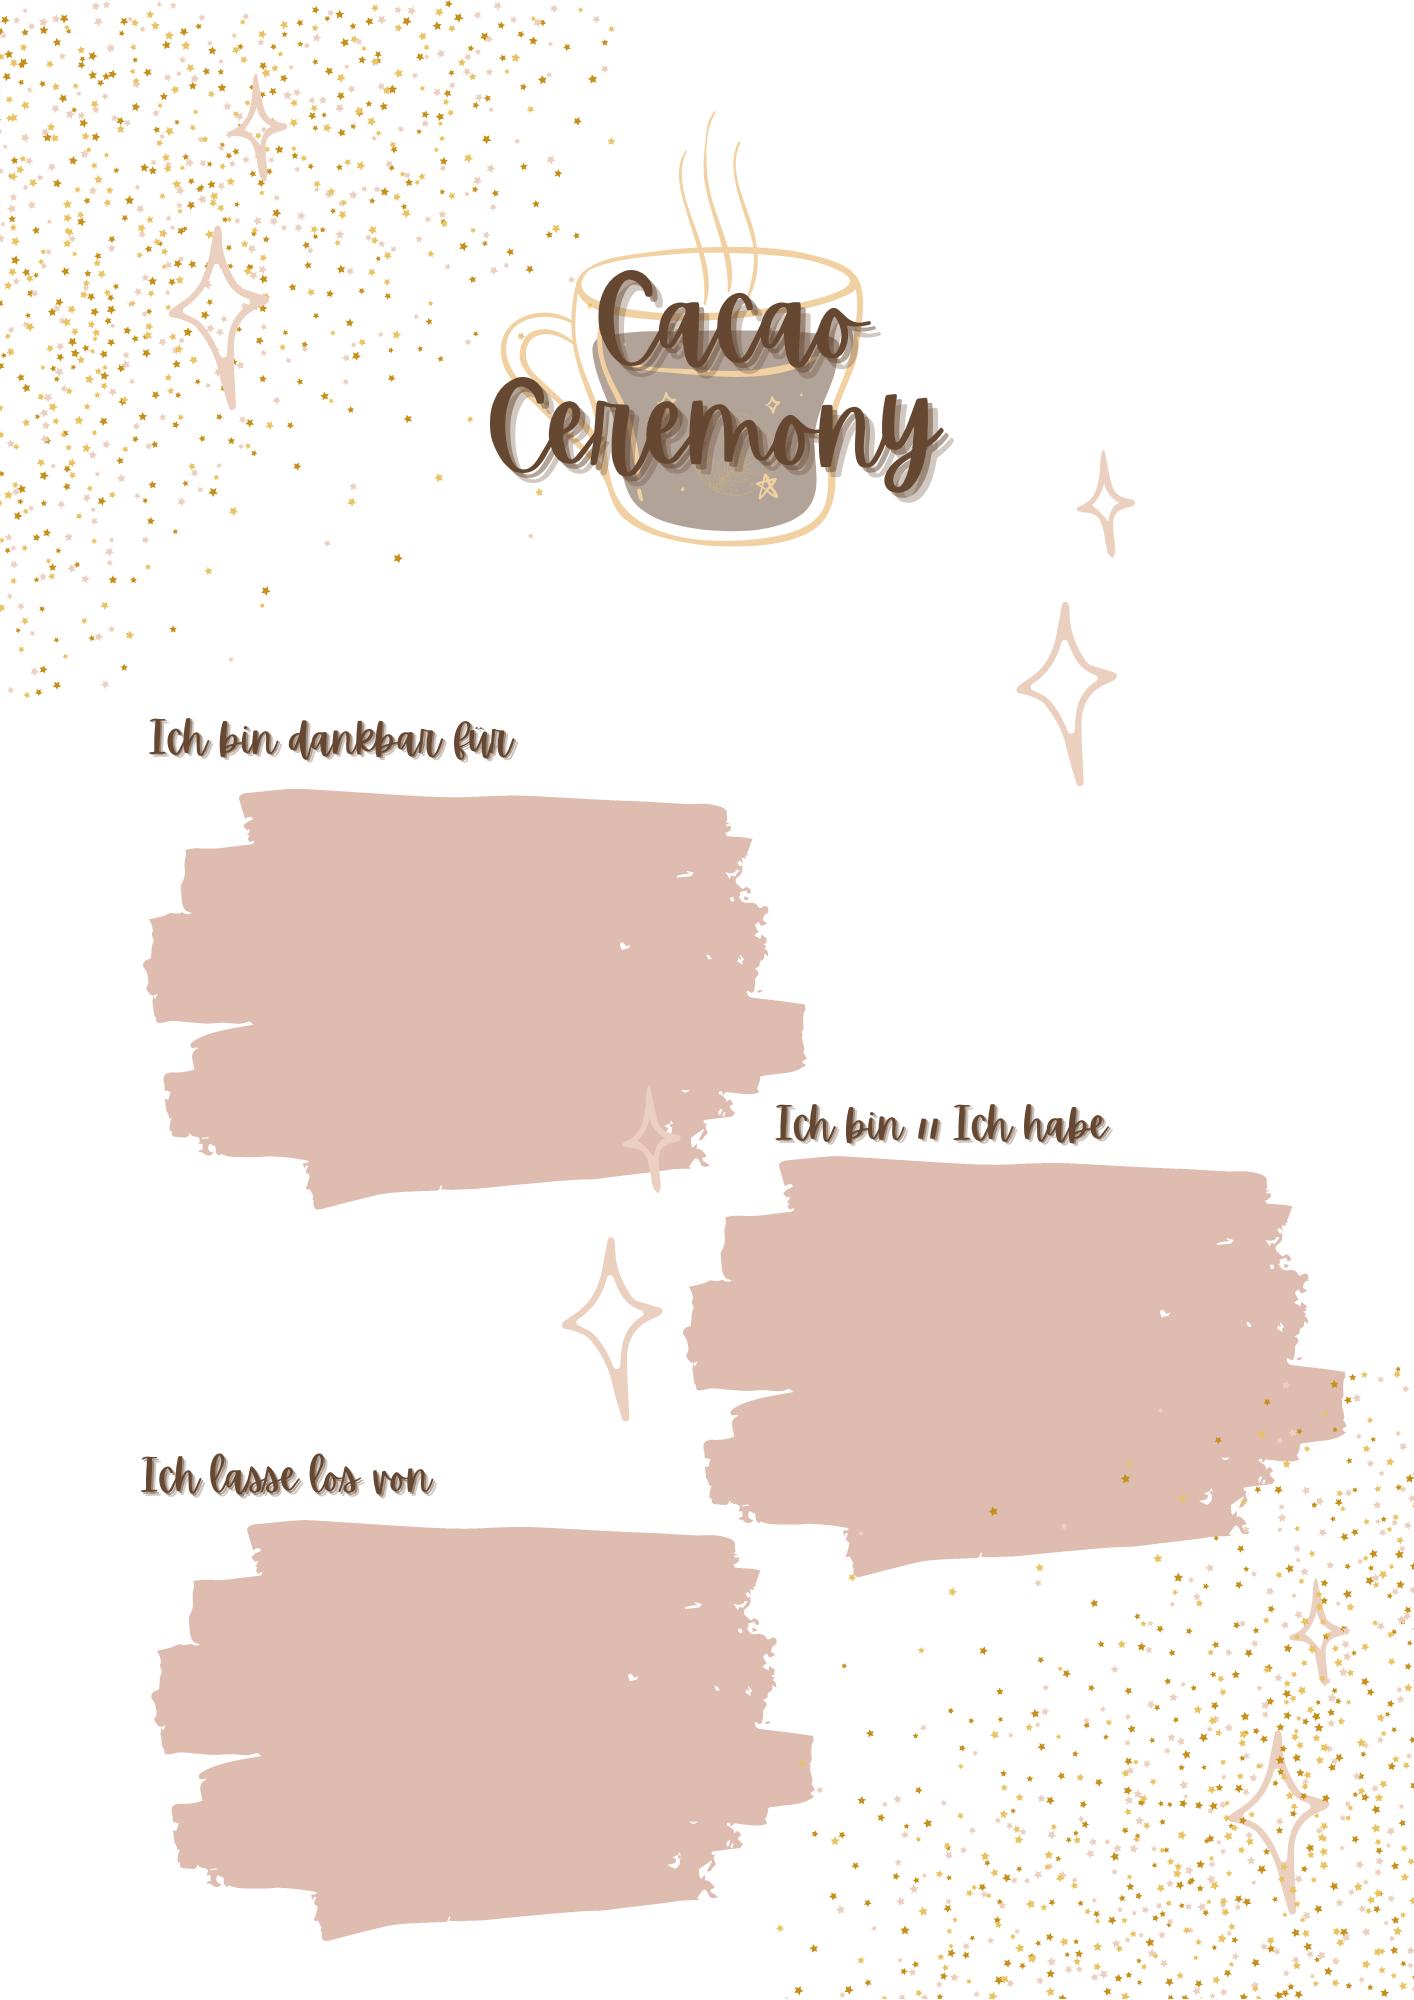 Kakaozeremonie Arbeitsblatt